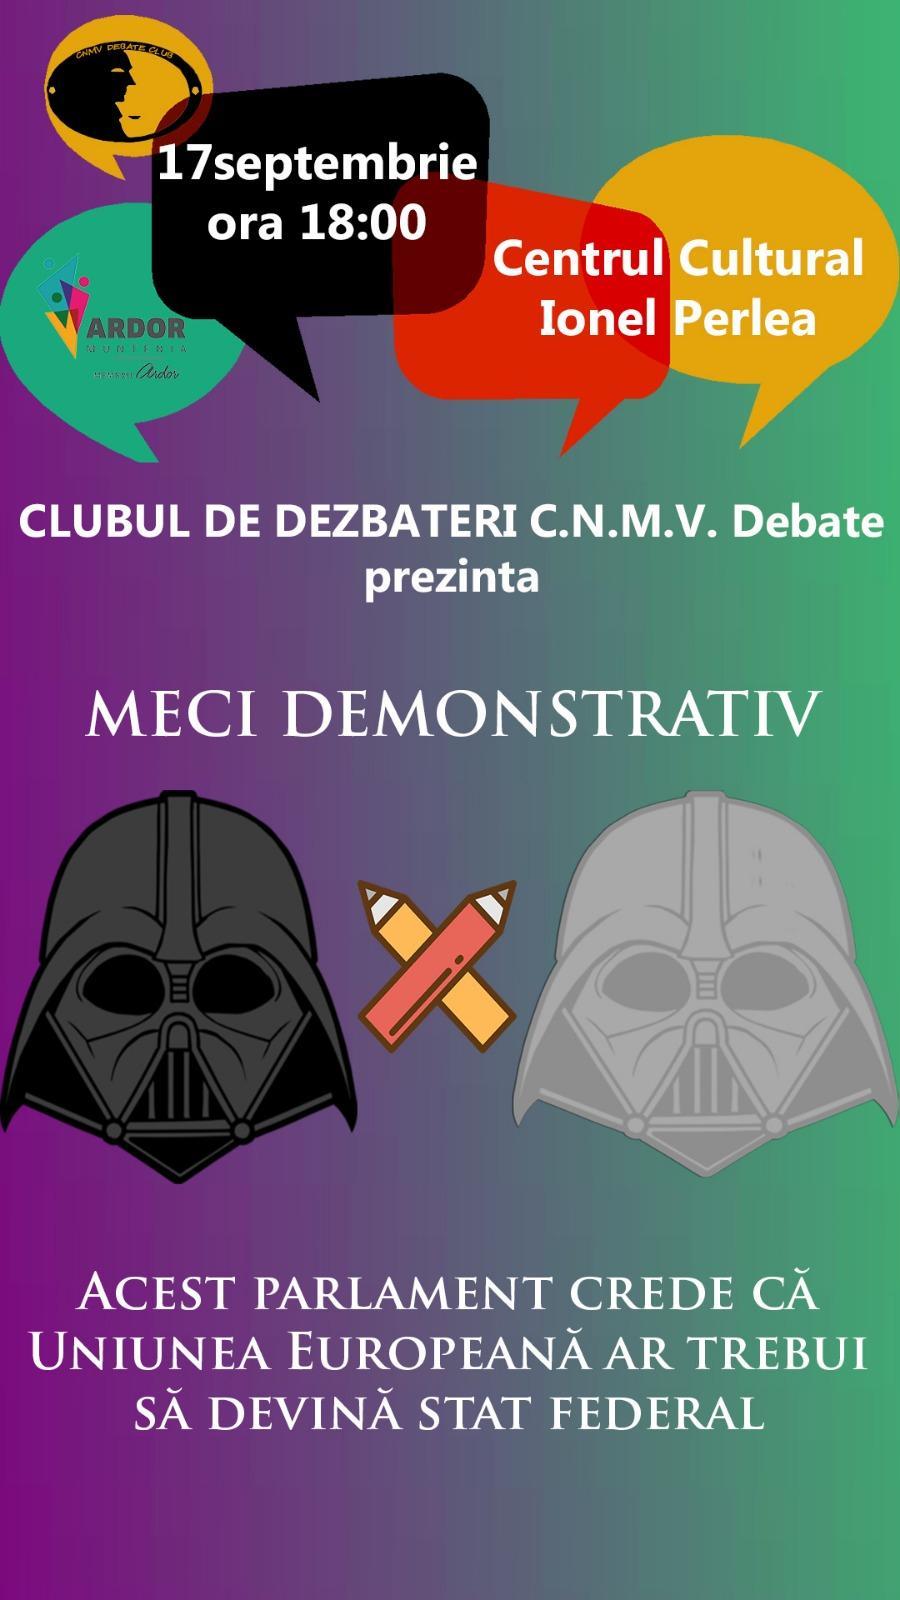 Dezbatere, 17 septembrie 2019, ora 18:00